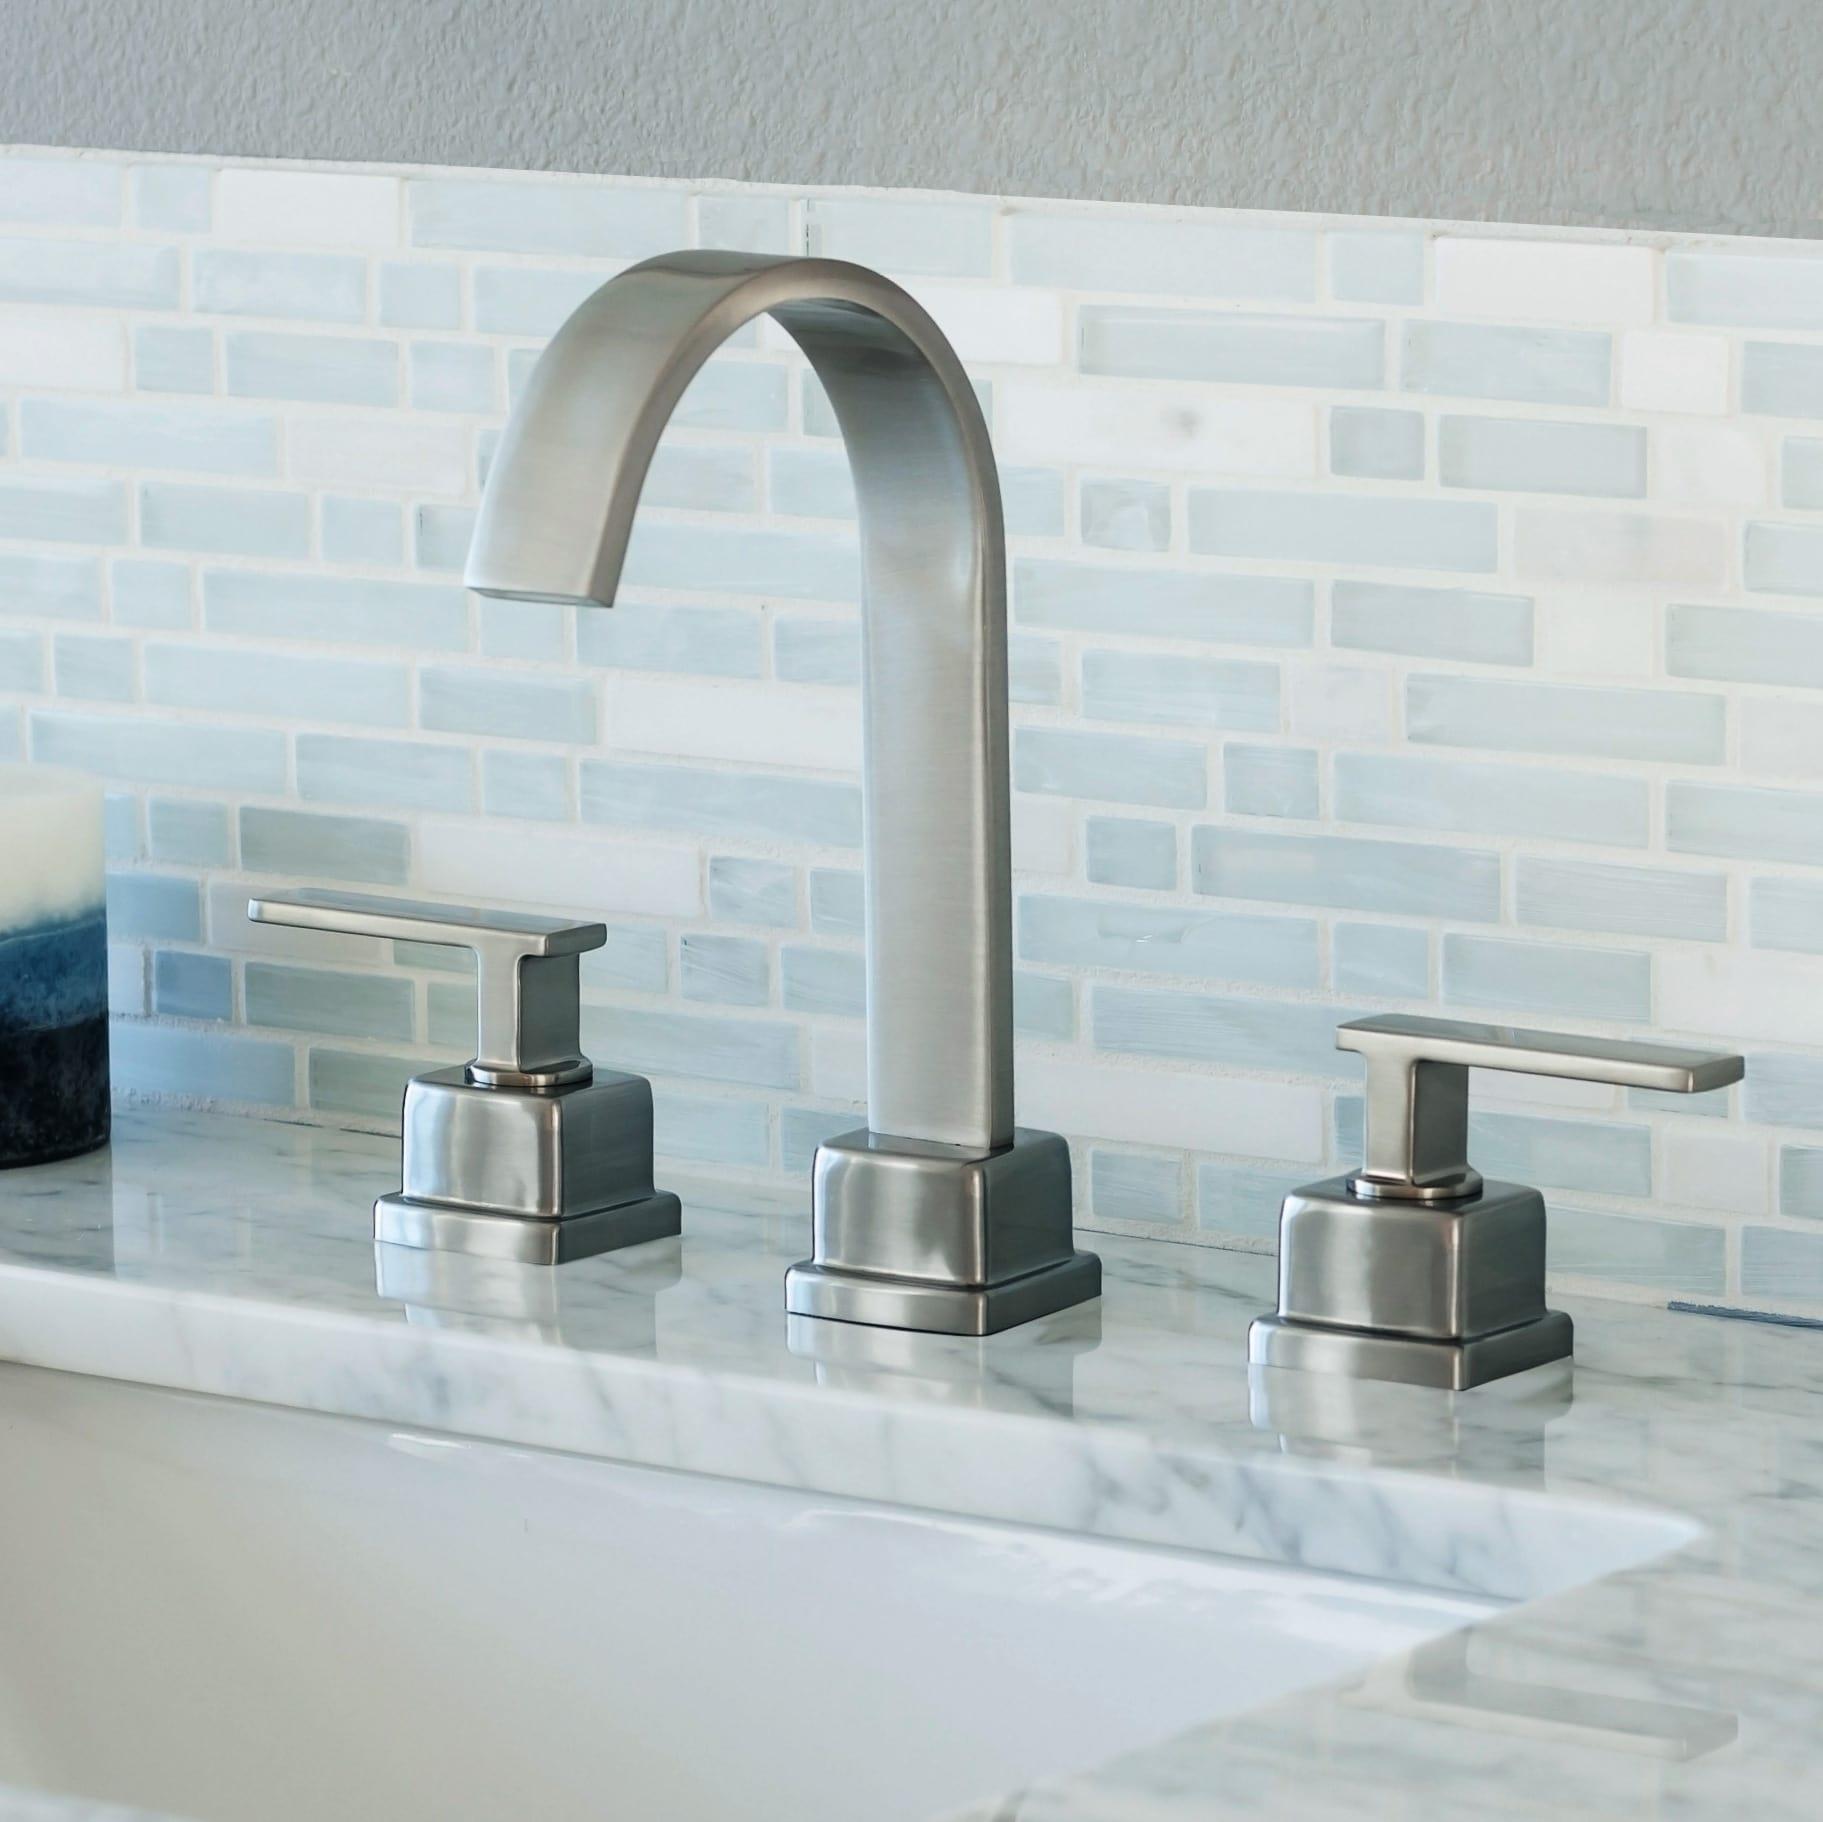 Miseno MNO441BN Brushed Nickel Elysa-R Widespread Bathroom Faucet ...